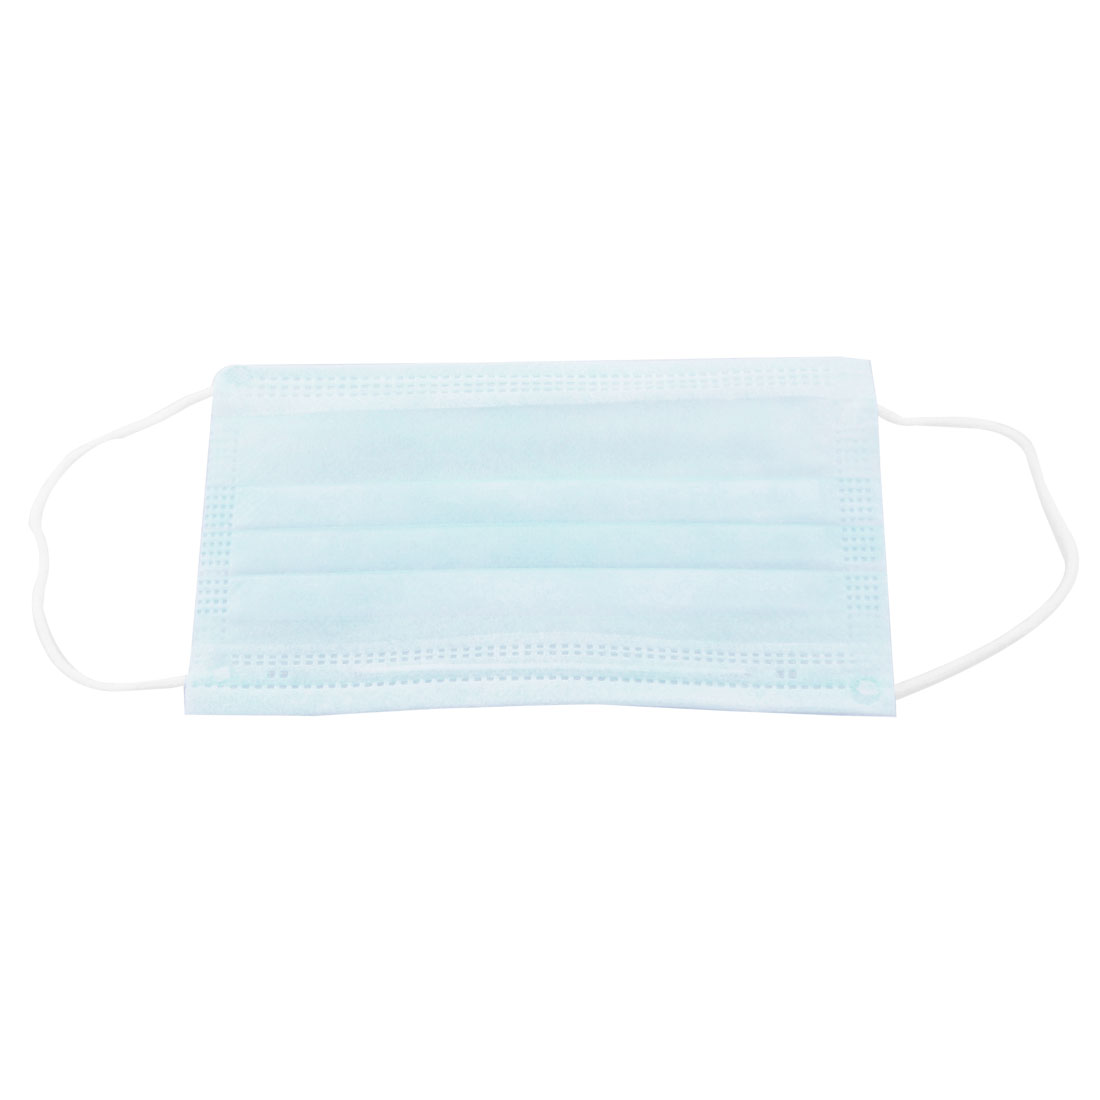 7 Pcs Blue Oral Surgery Mouth Face Protective Disposable Masks